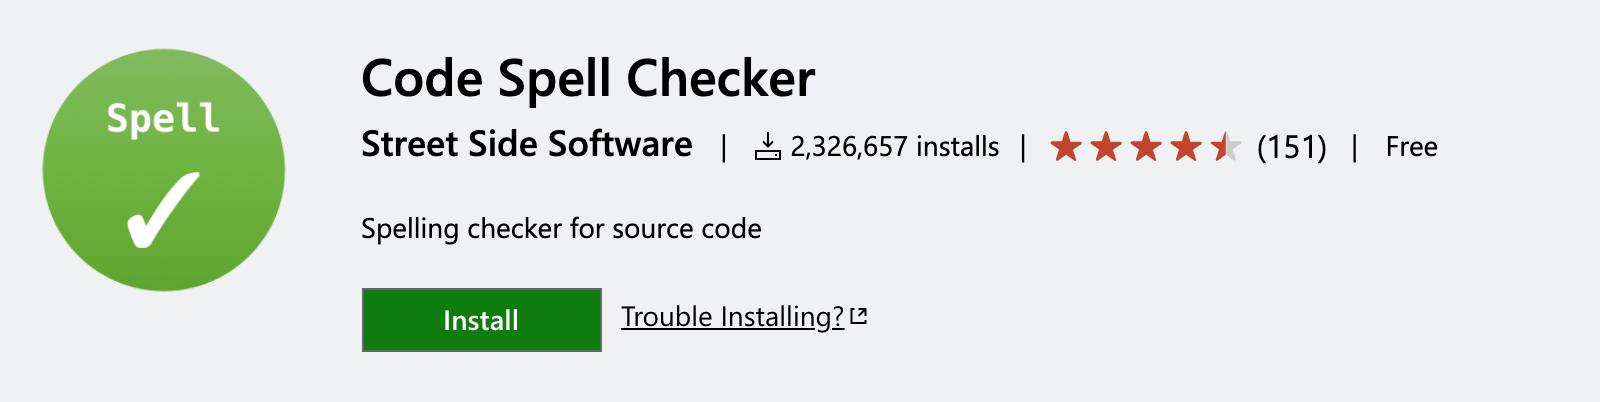 Code Spell Checker extension